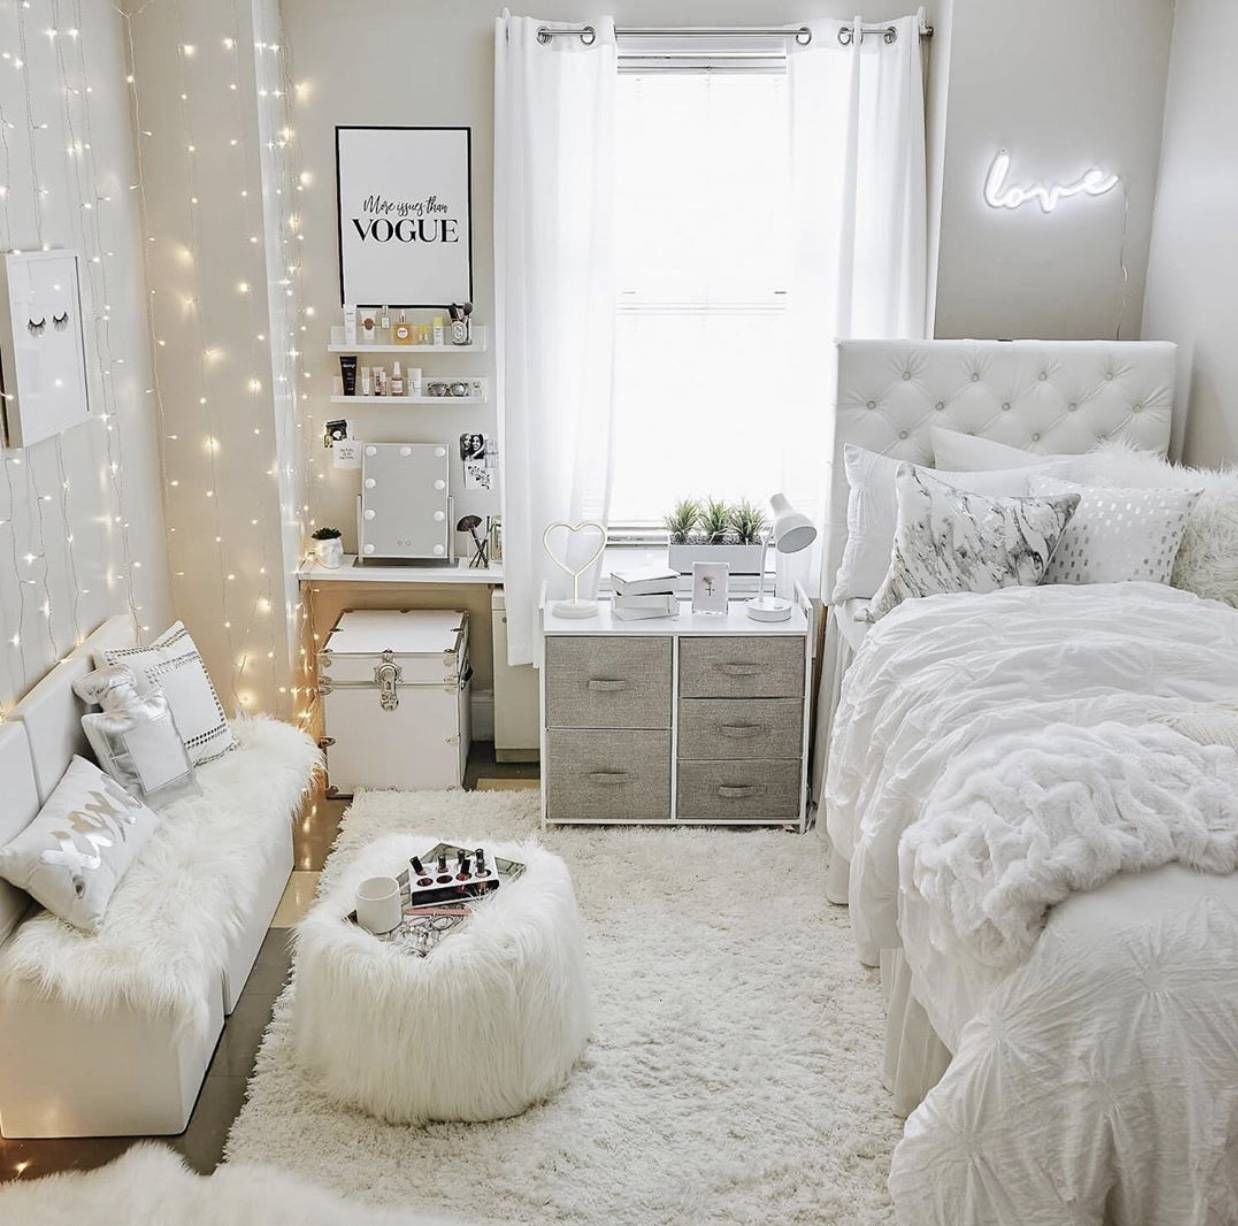 Vsco Room Ideas How To Create A Cute Vsco Room College Room